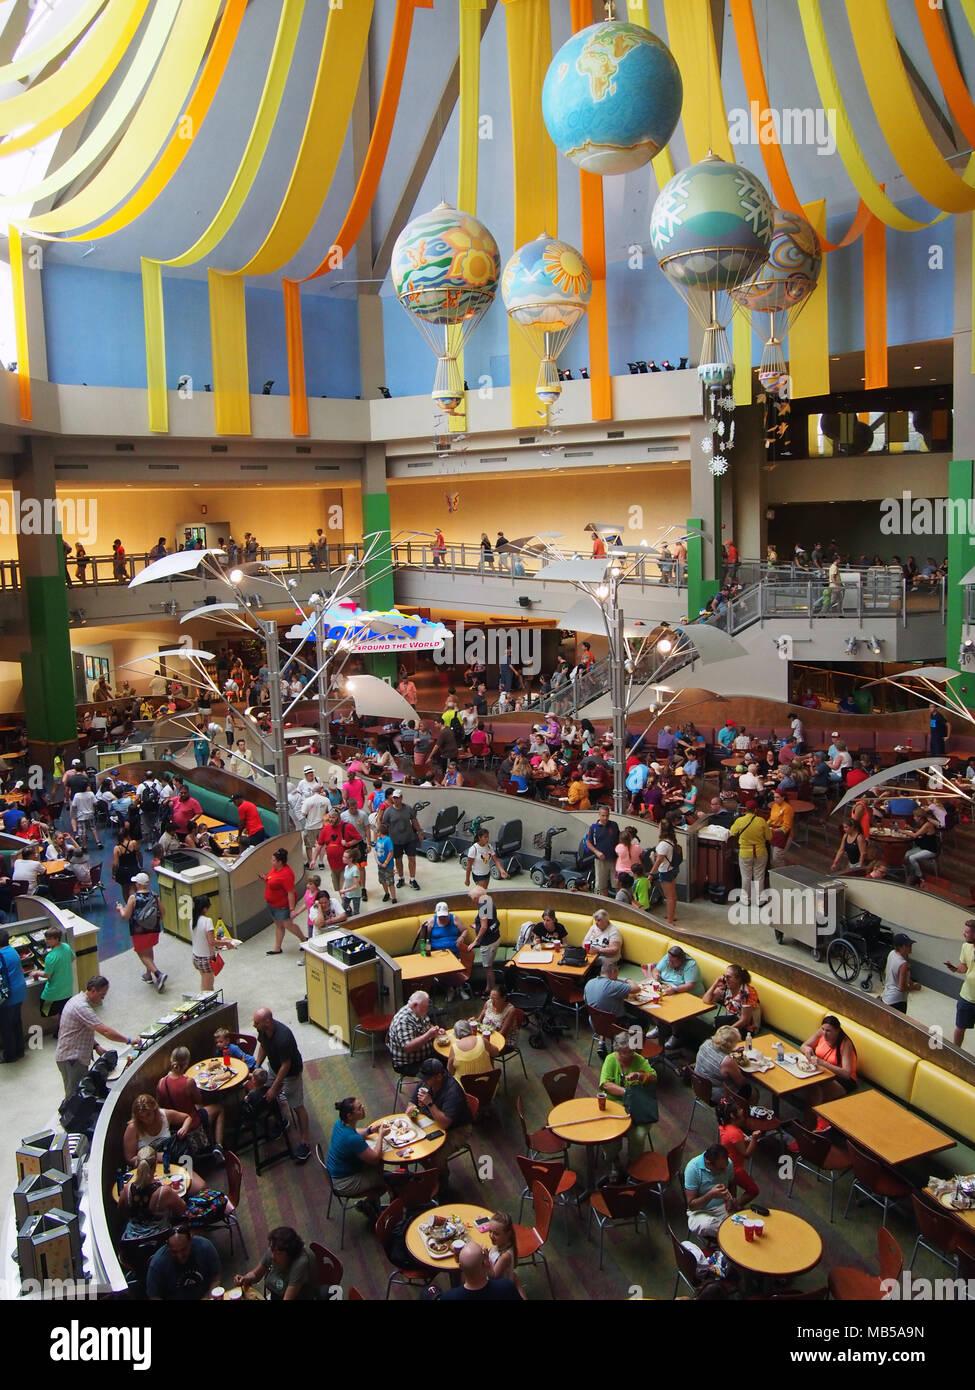 View of the The Land Pavilion Food Court at Epcot Center, World Disney World, Orlando, Florida 2017 © Katharine Andriotis - Stock Image